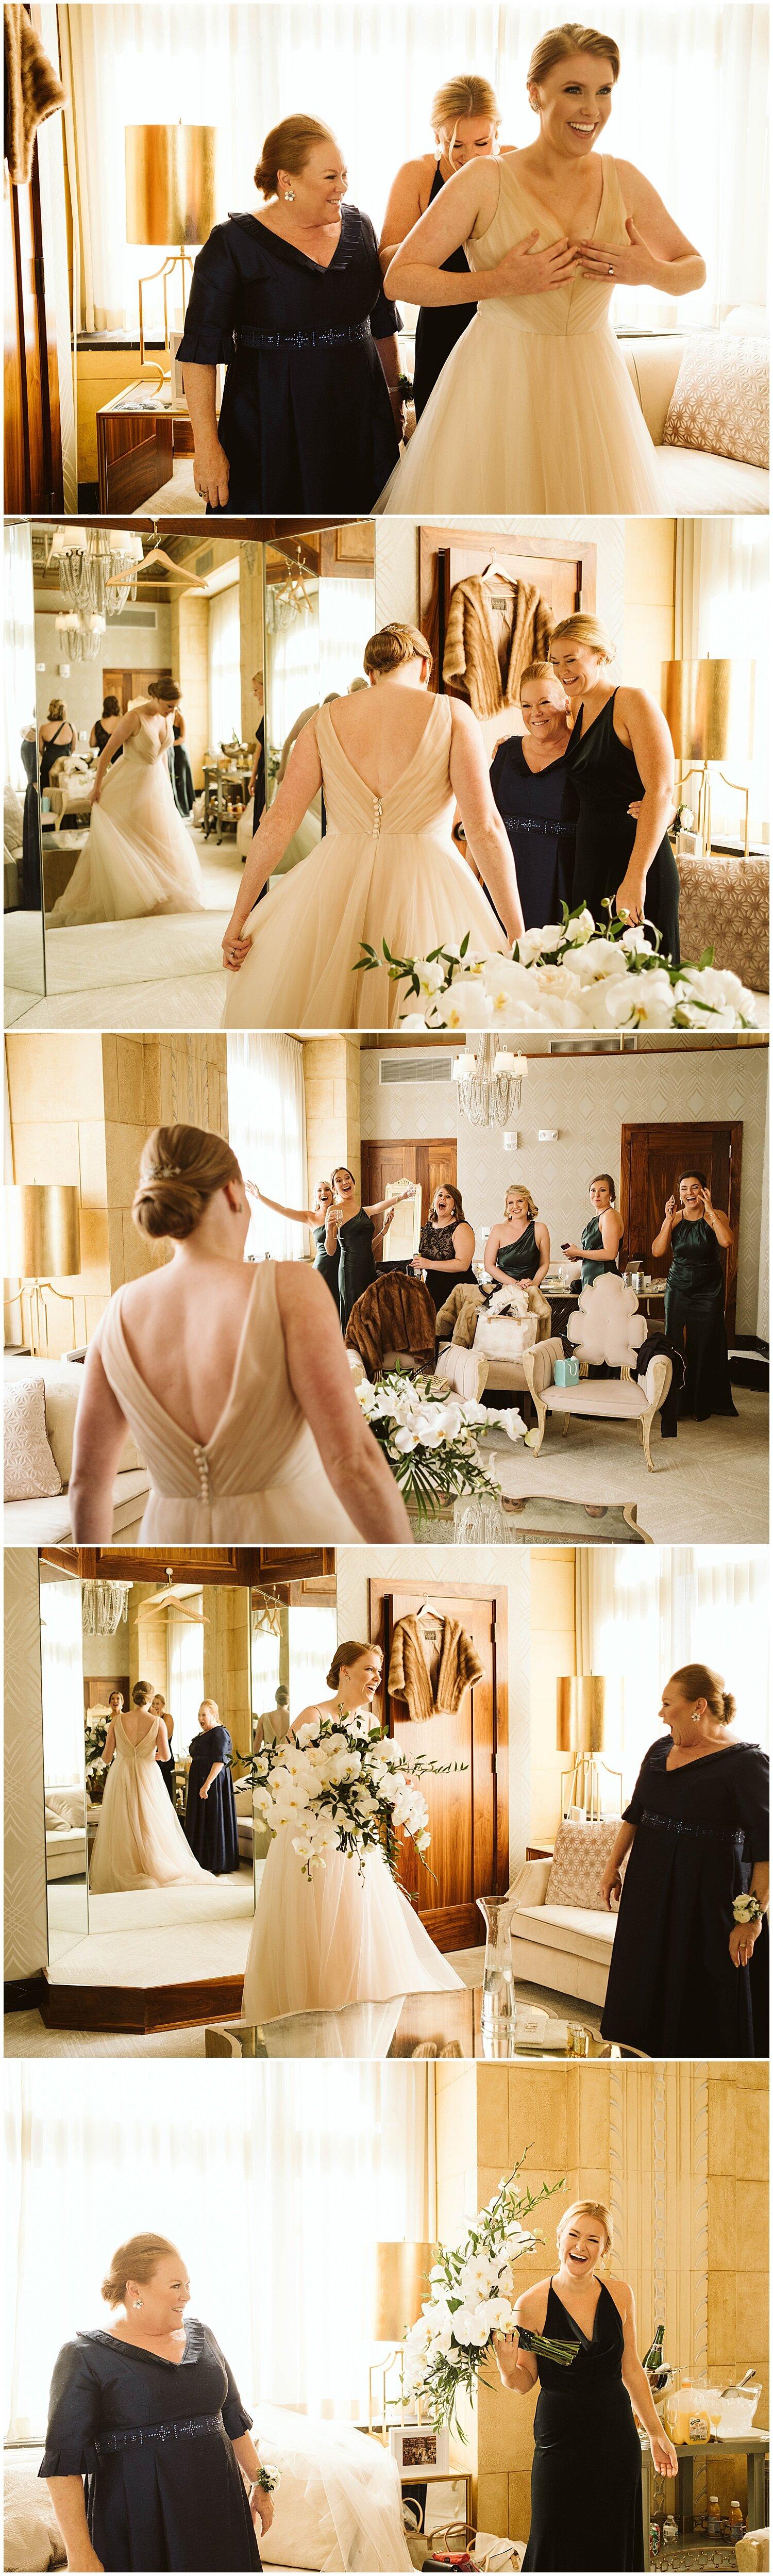 The Grand Hall Kansas City Wedding_0009.jpg